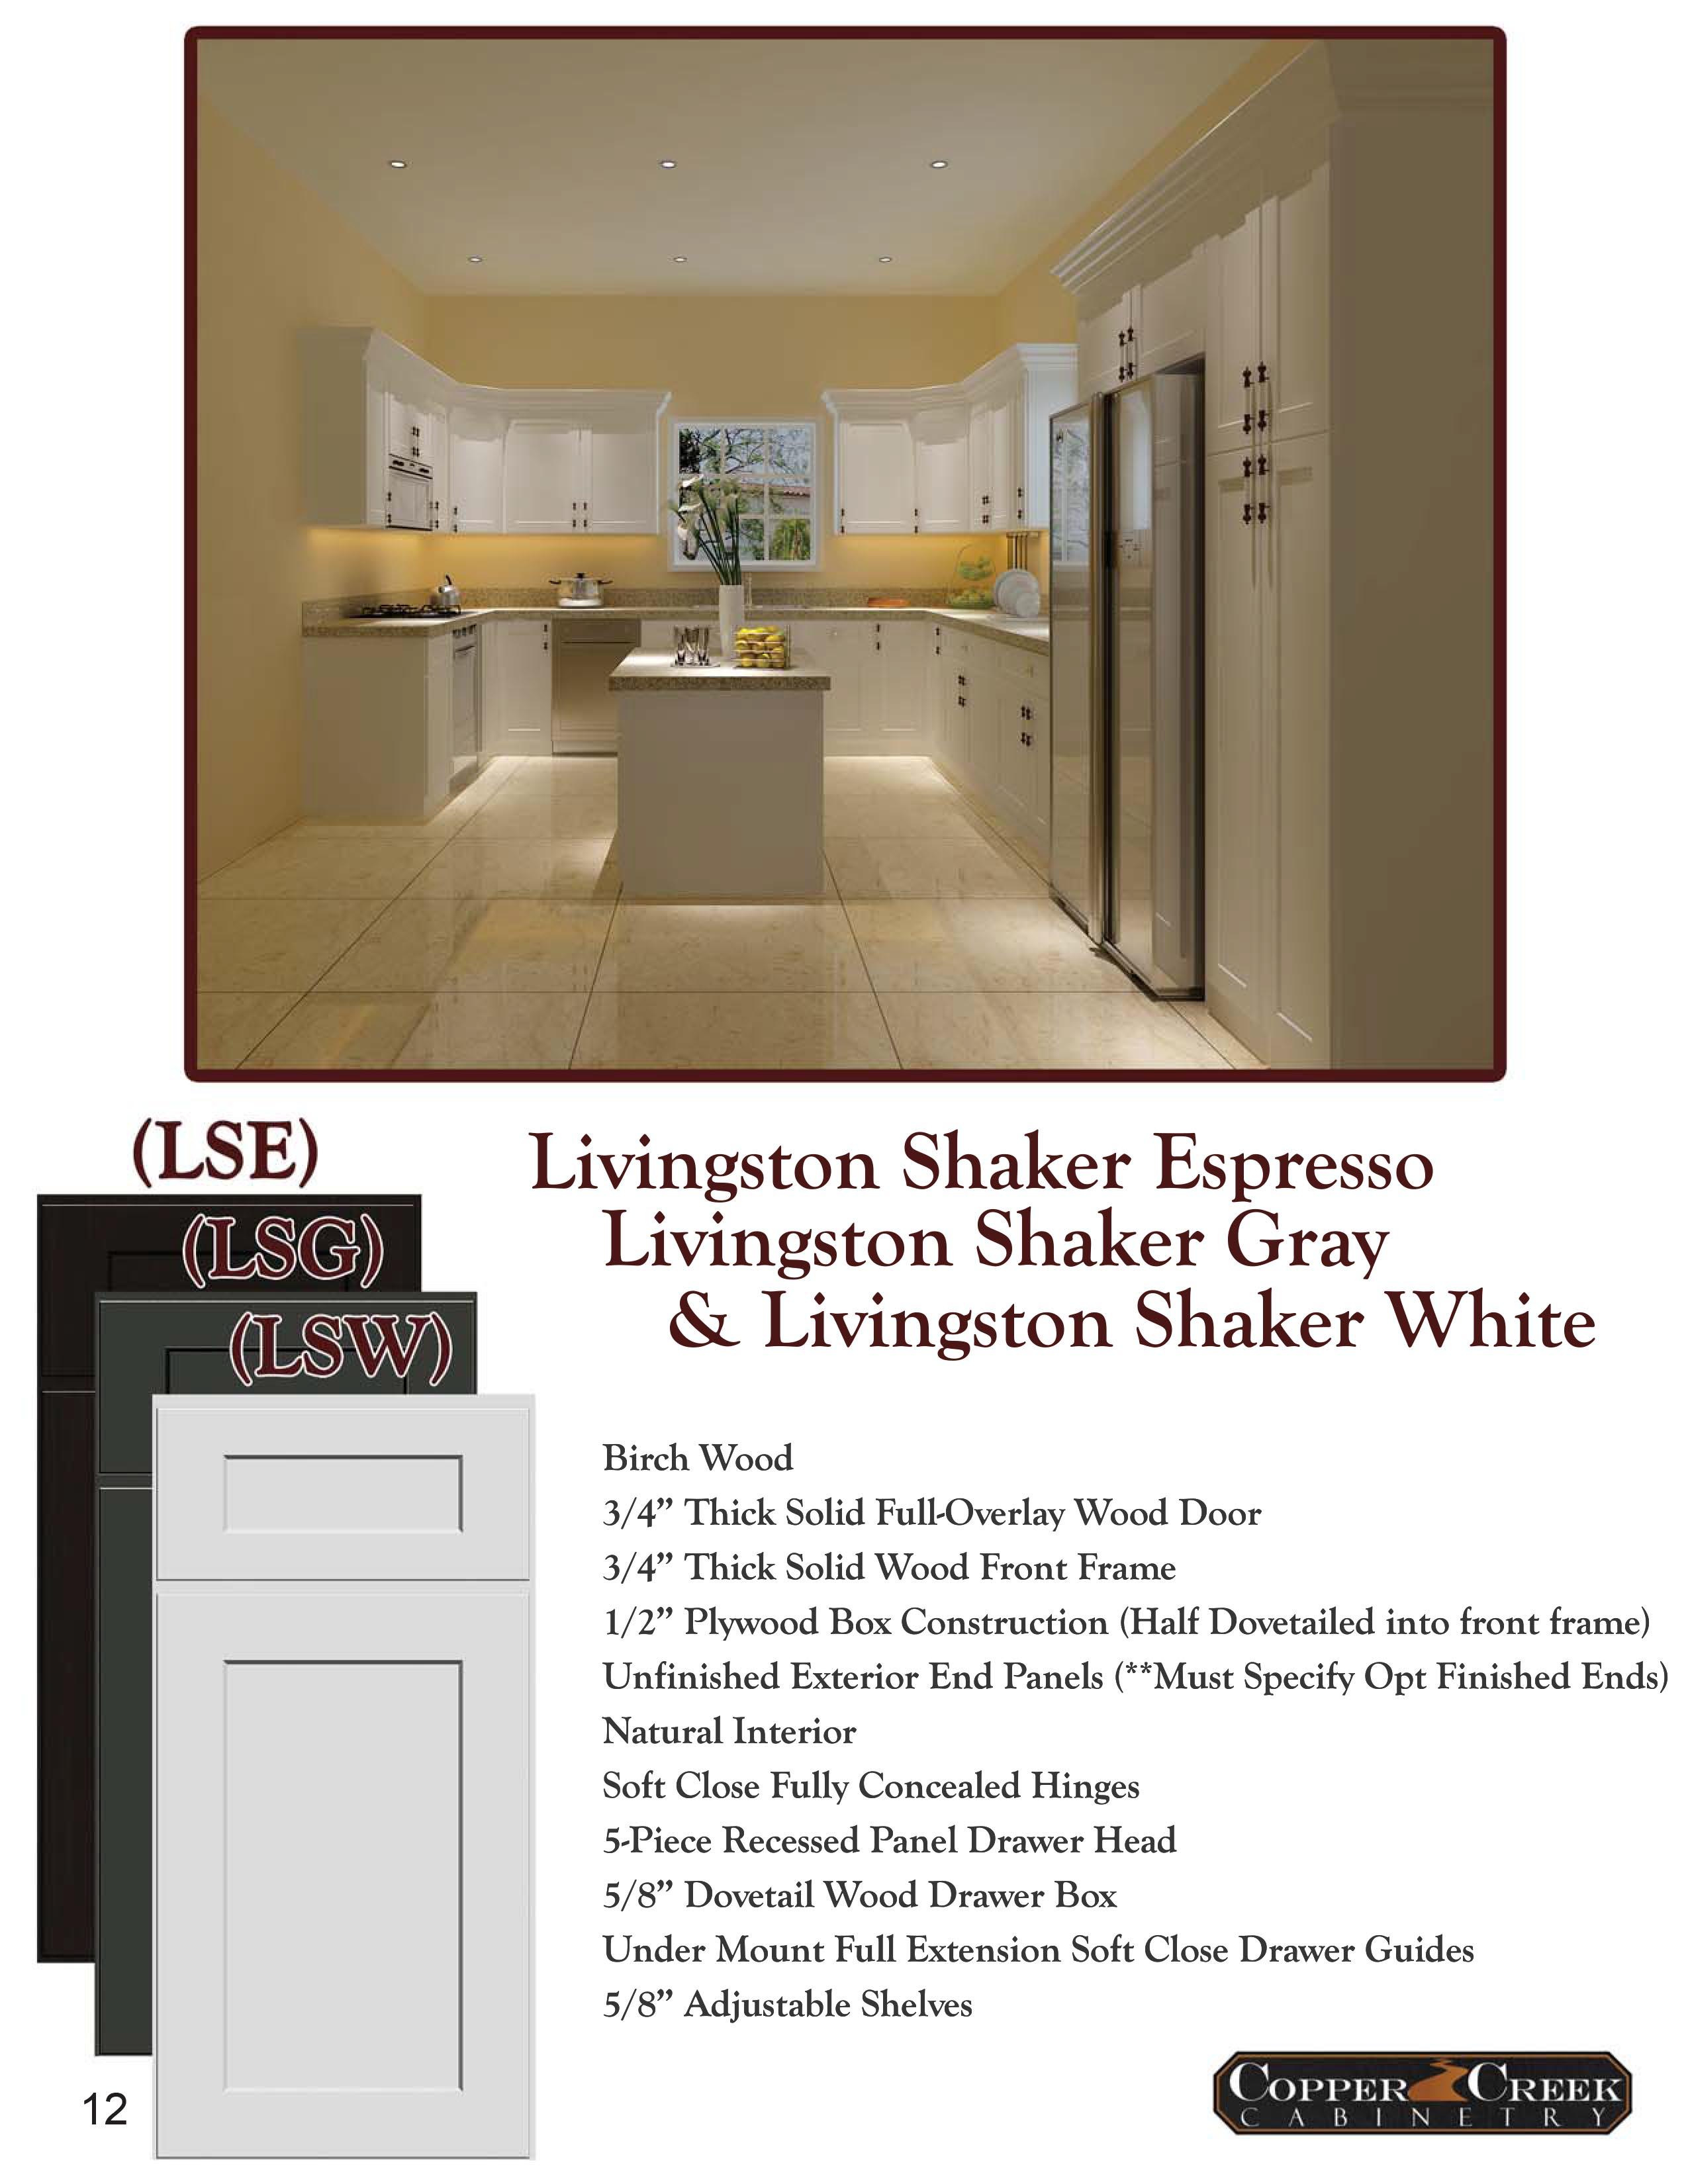 Livingstone Shaker page